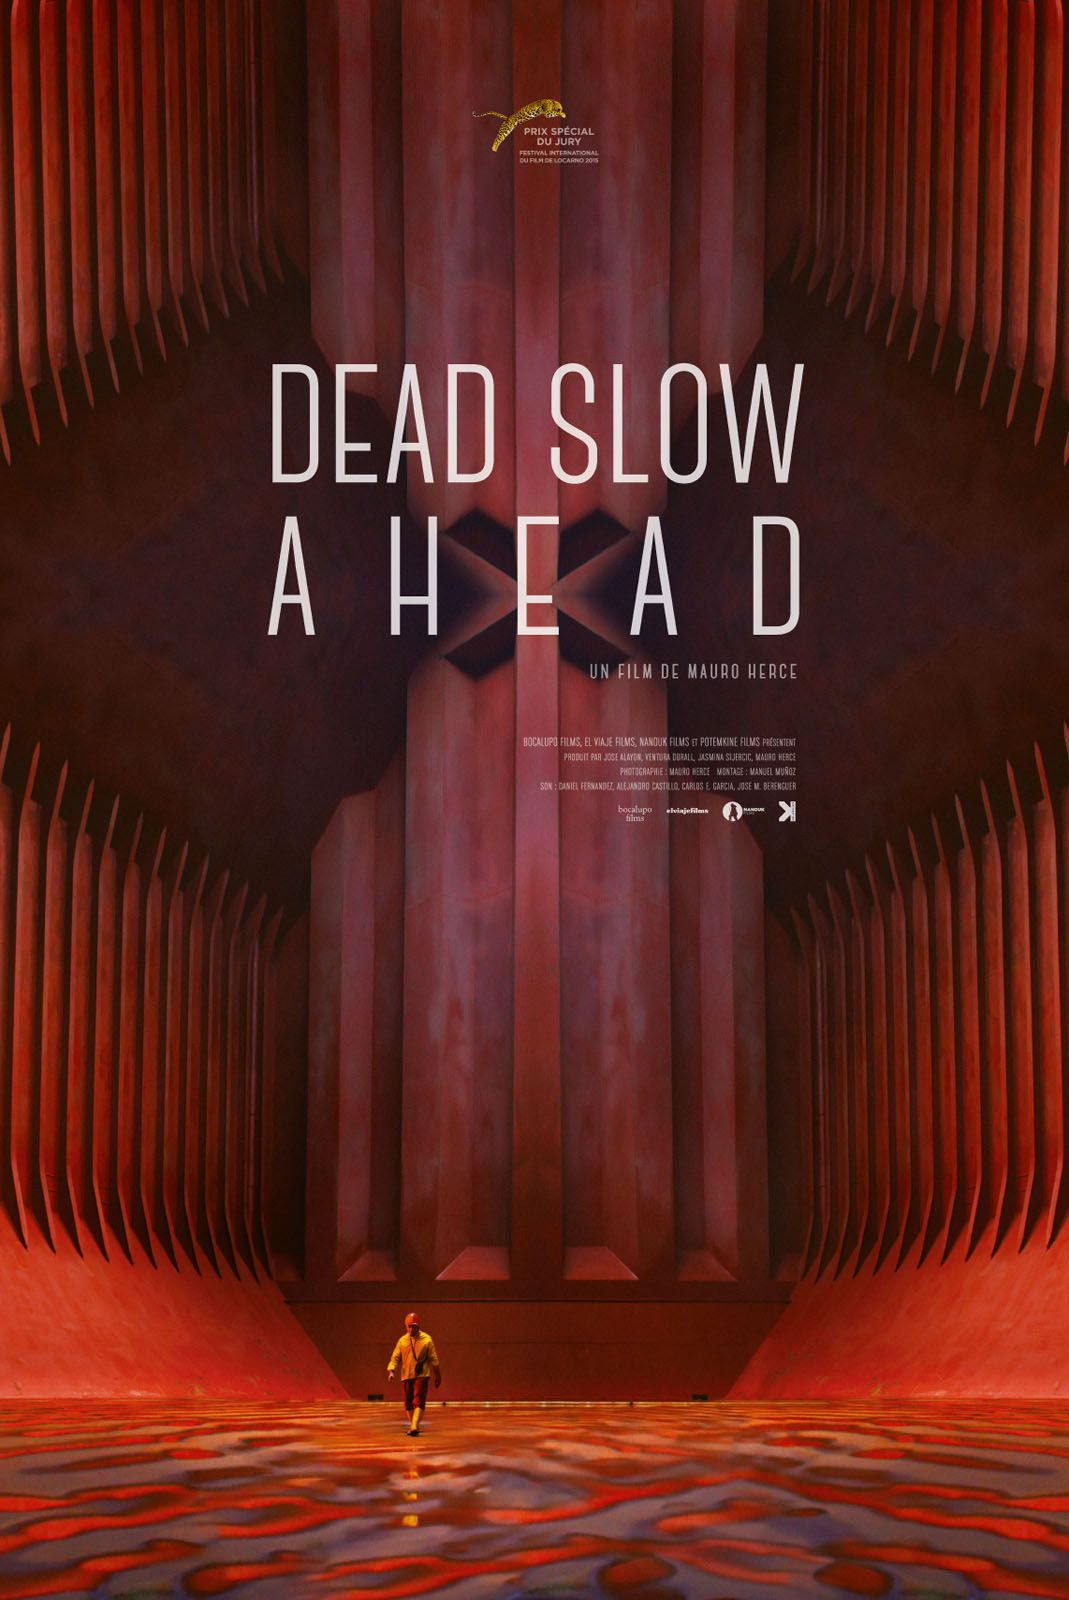 Dead Slow Ahead - Documentaire (2015)